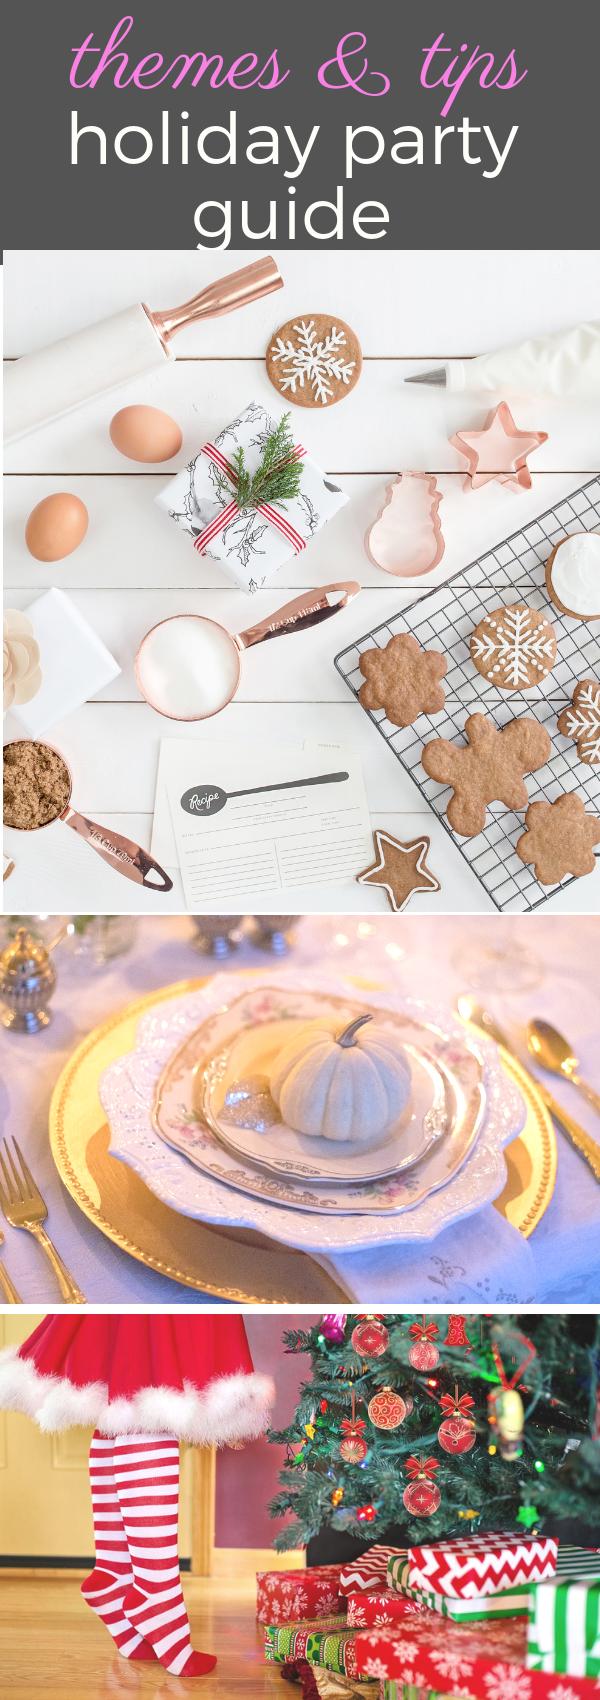 Holiday Party Ideas Tinselbox